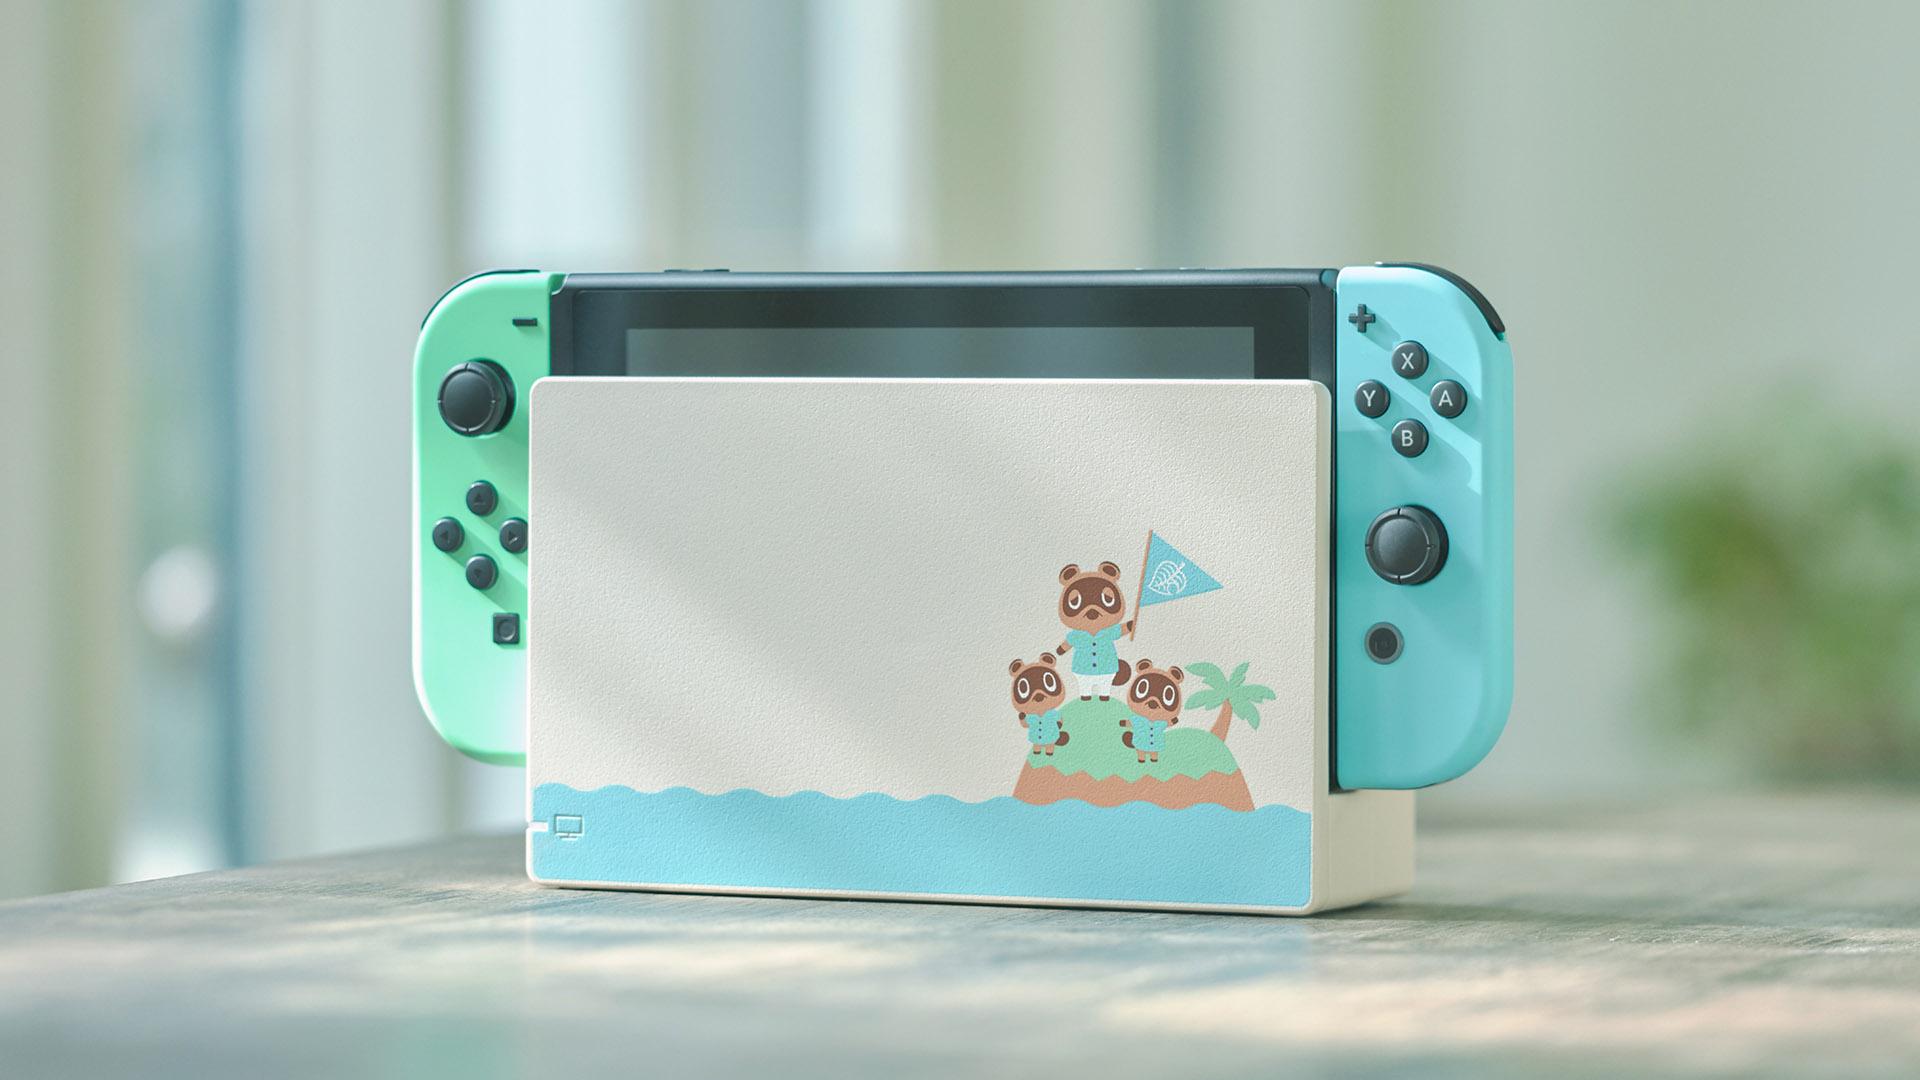 Nintendo Switch a tema Animal Crossing: New Horizons